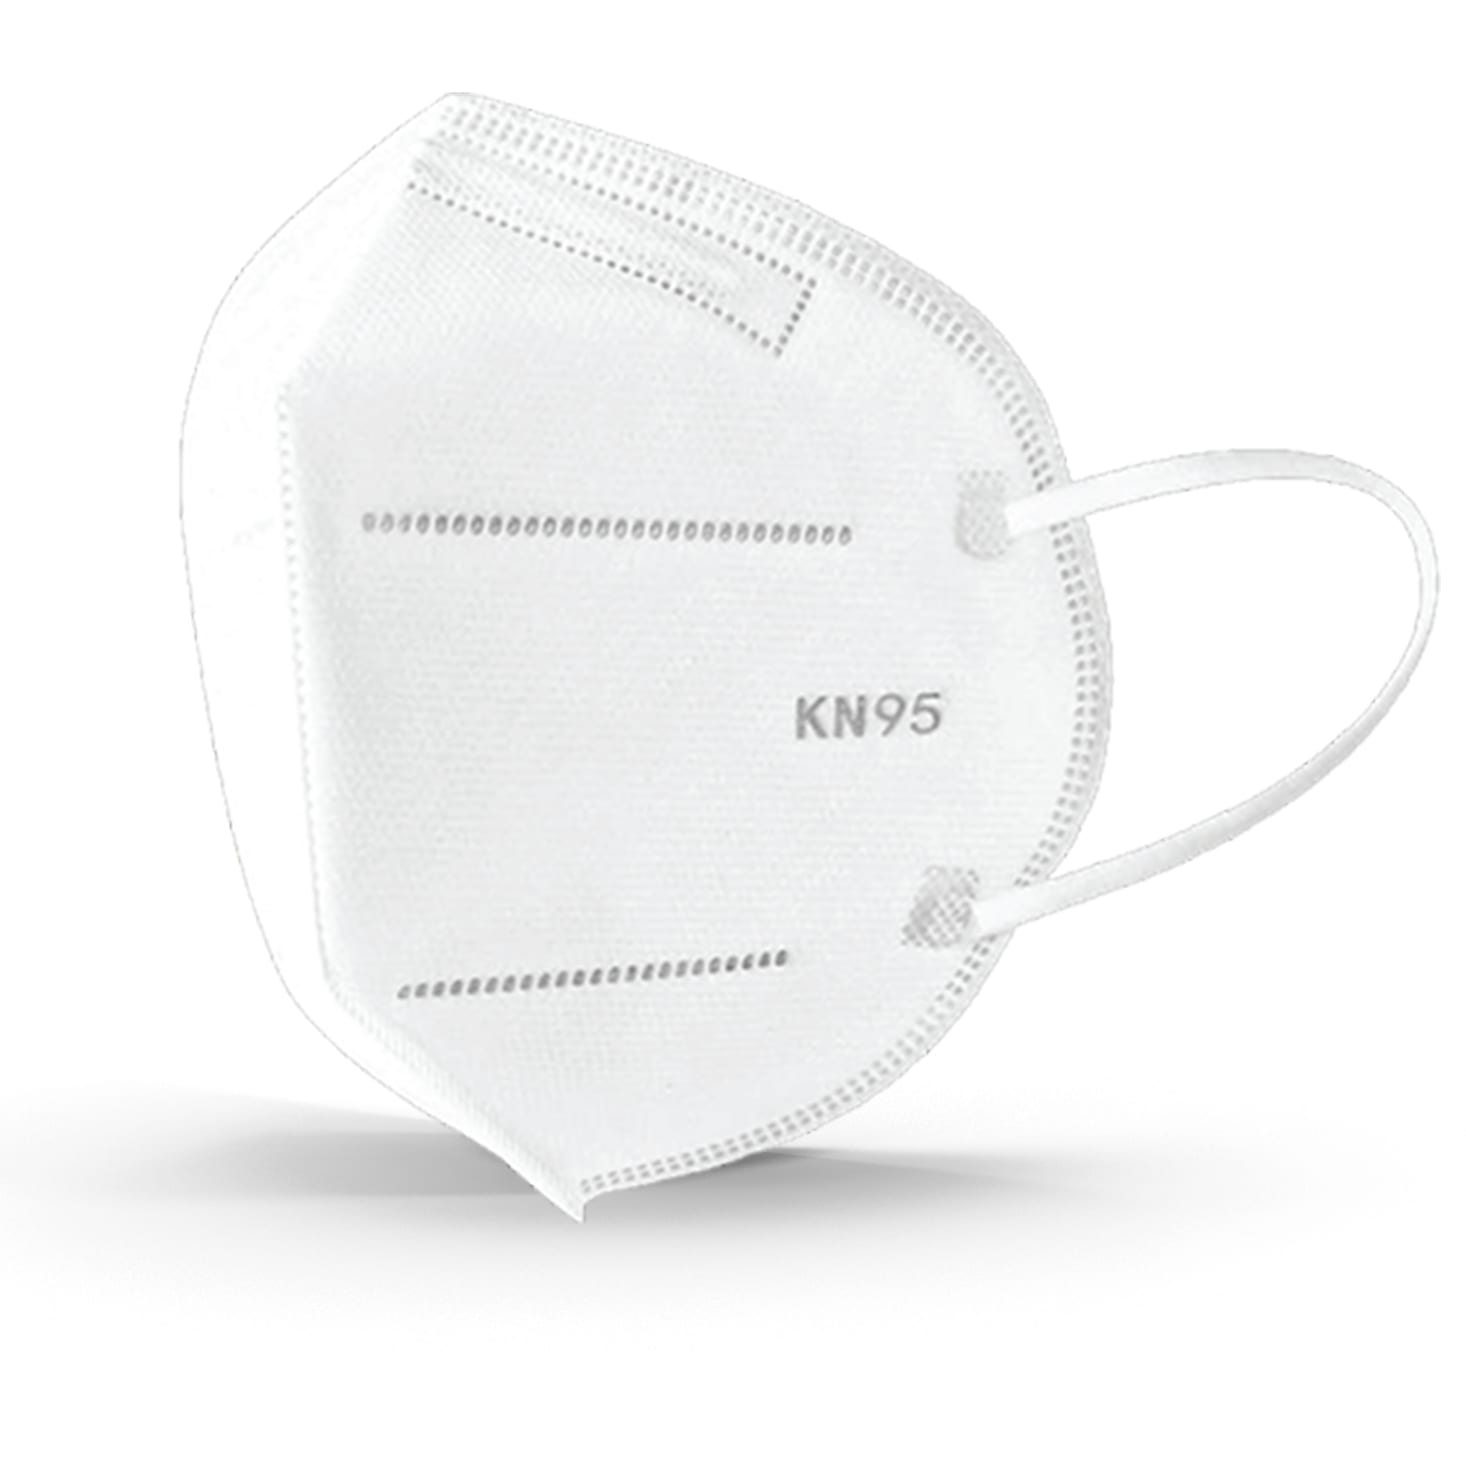 KN95 White mask